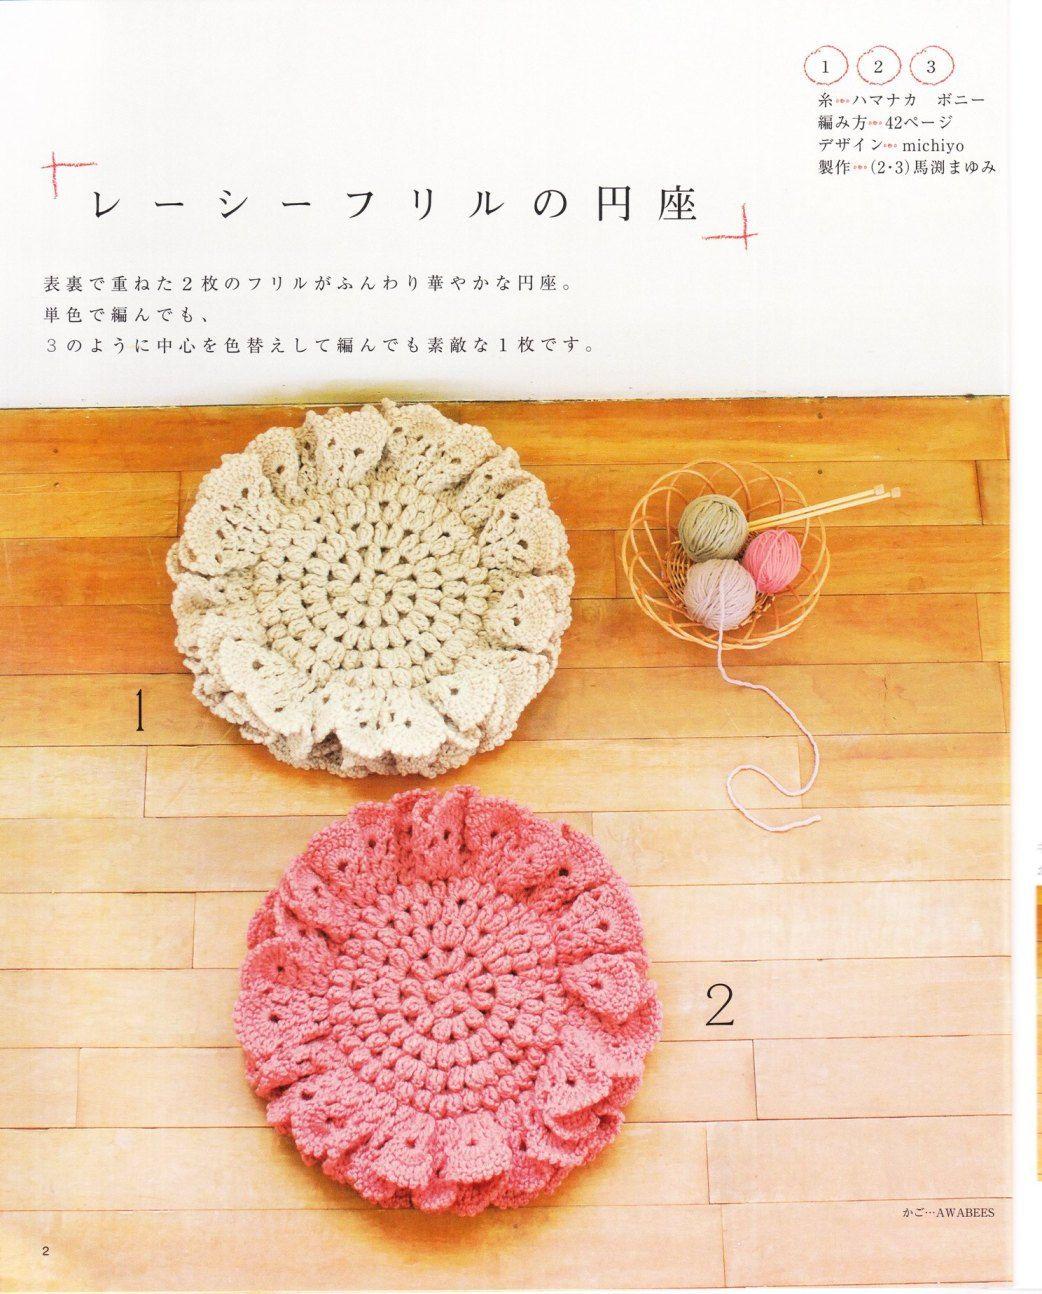 Crochet seat cushion cover pattern crochet seat cover pattern ...